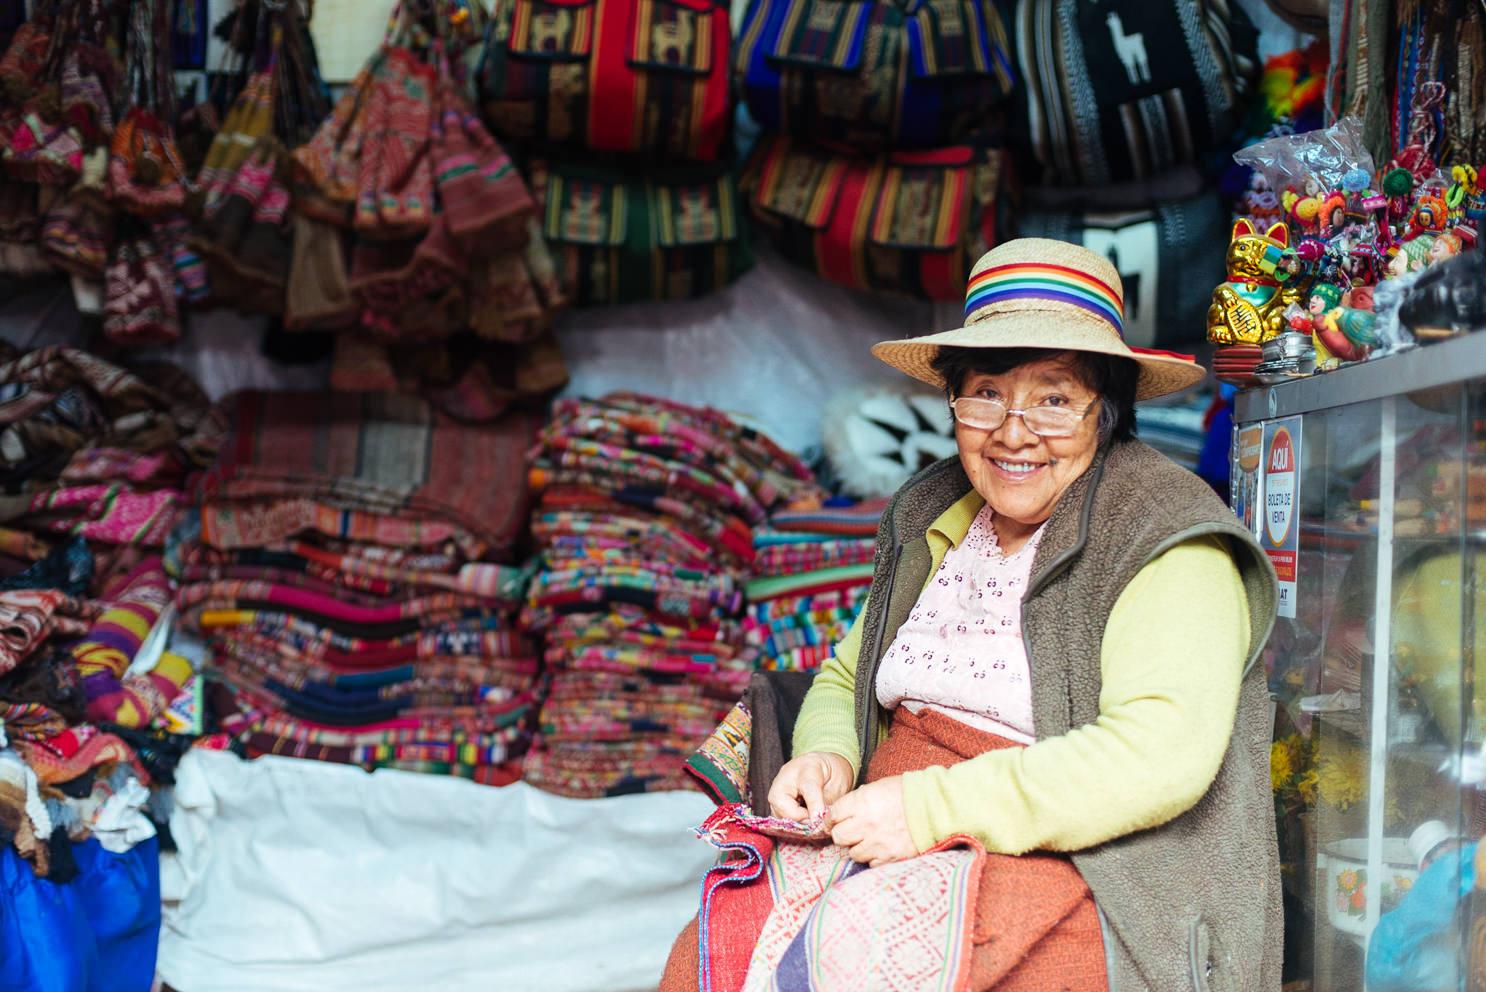 Margarita: Artian - Cusco, Peru